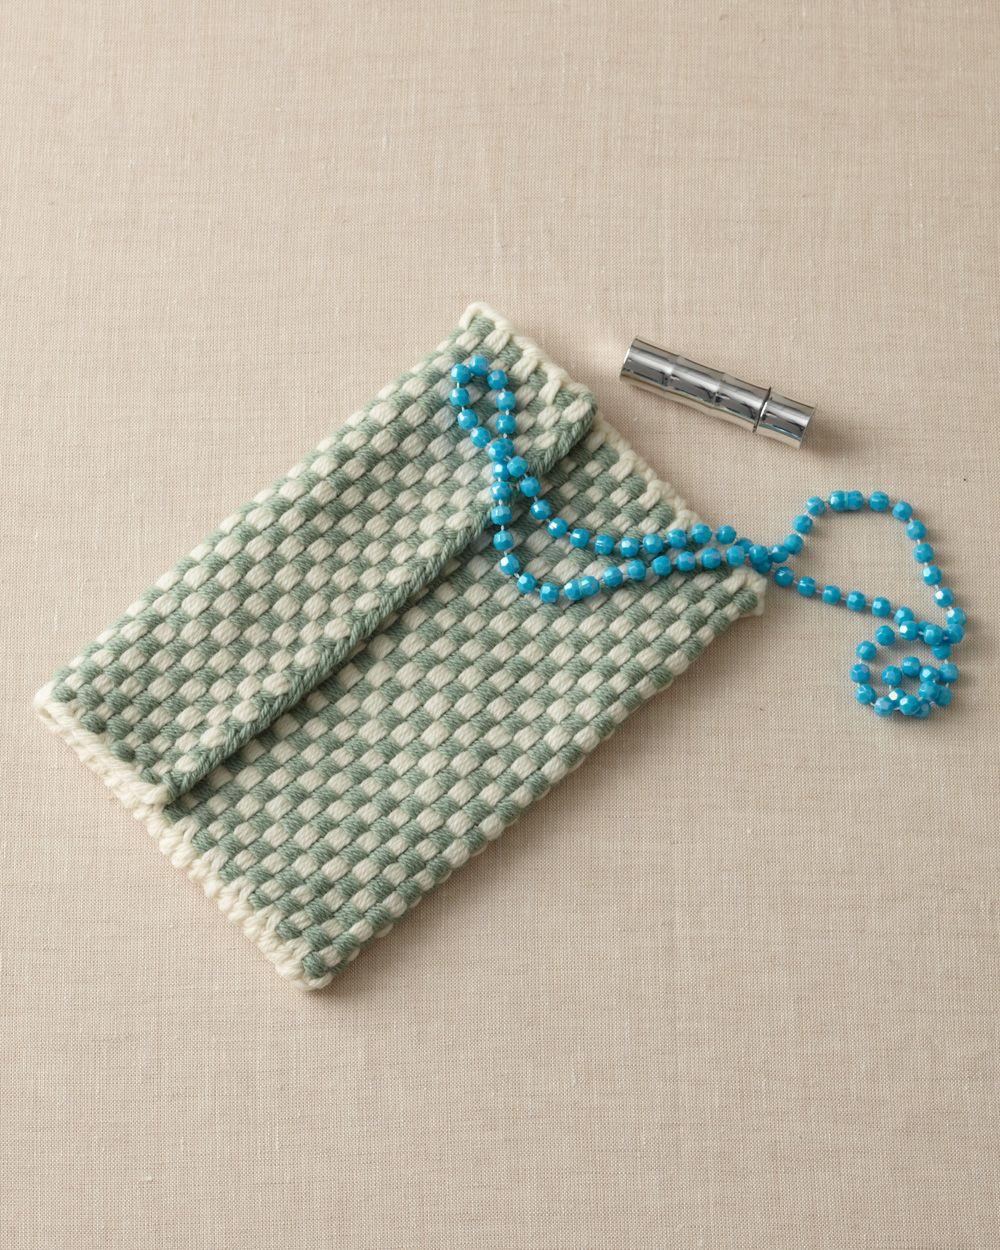 Martha Stewart Knitting Loom Patterns Free Loom Woven Pattern